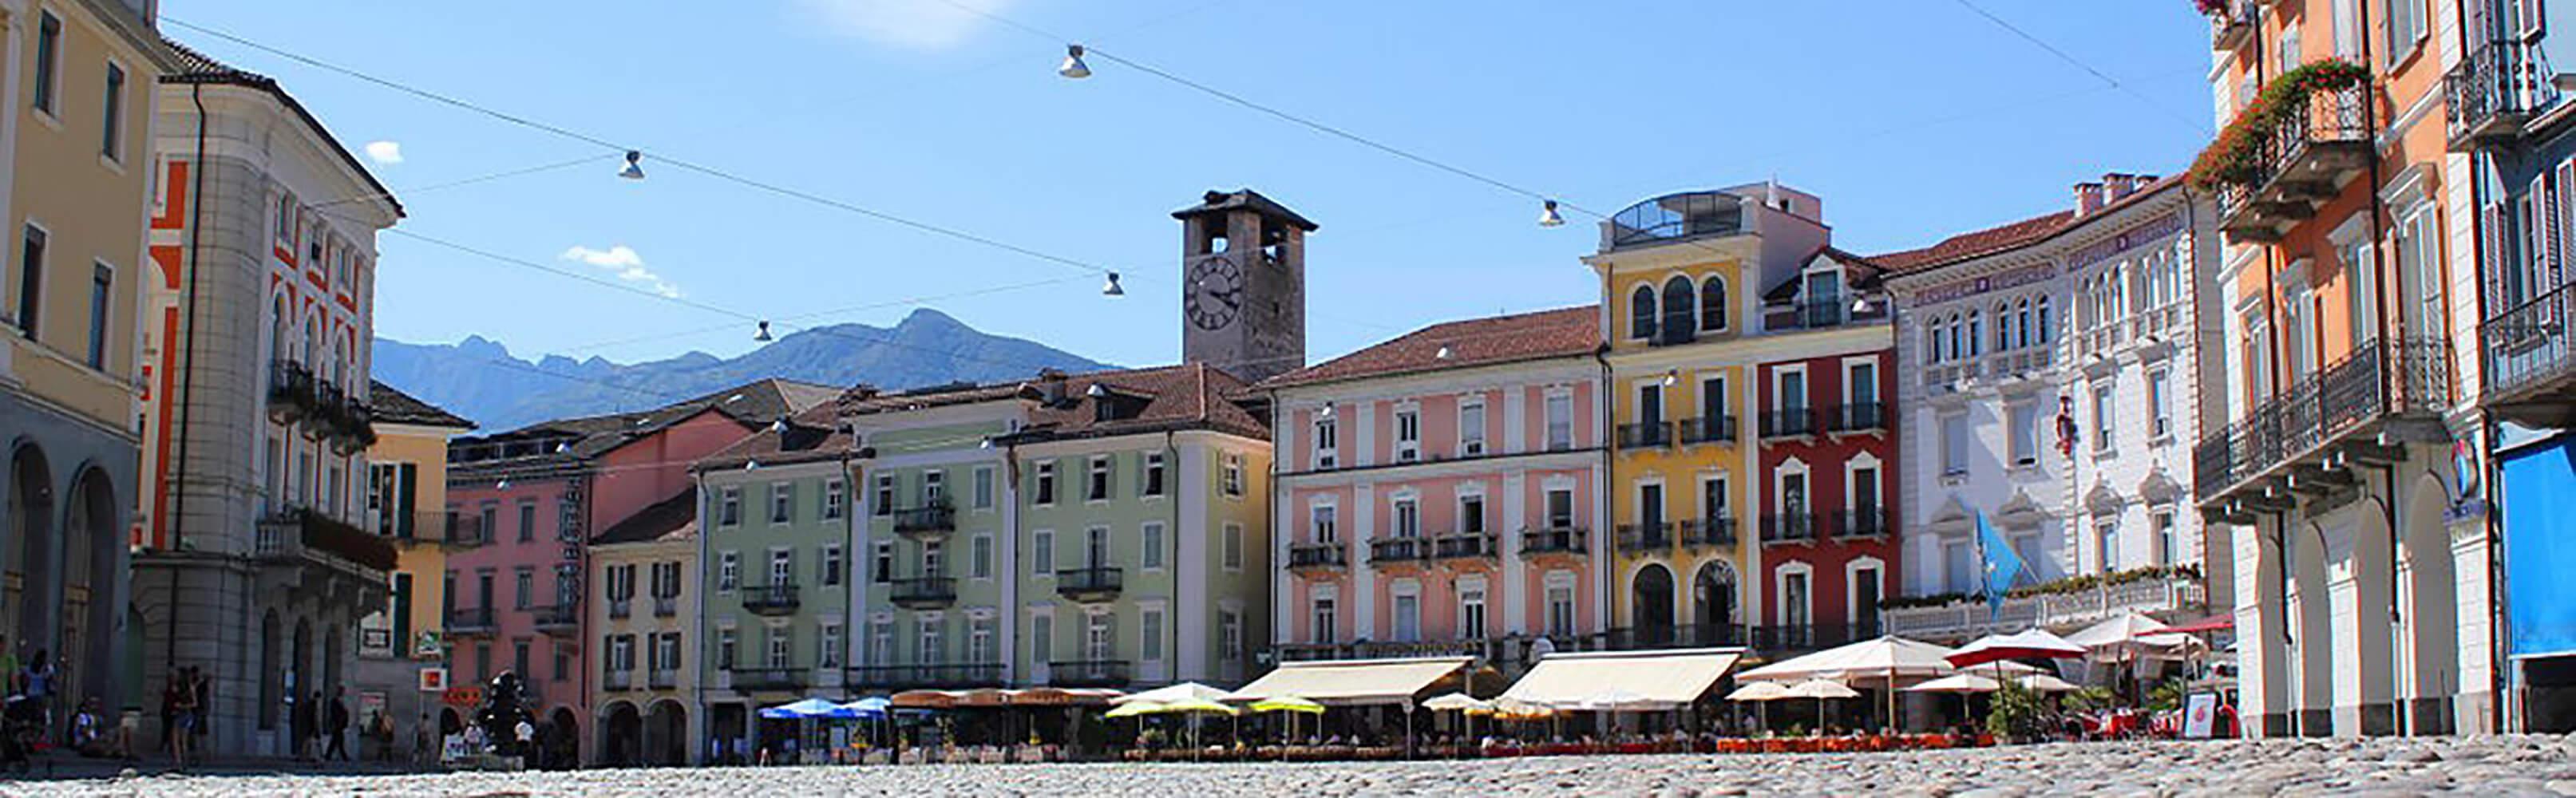 Ascona Locarno Tourismus 1